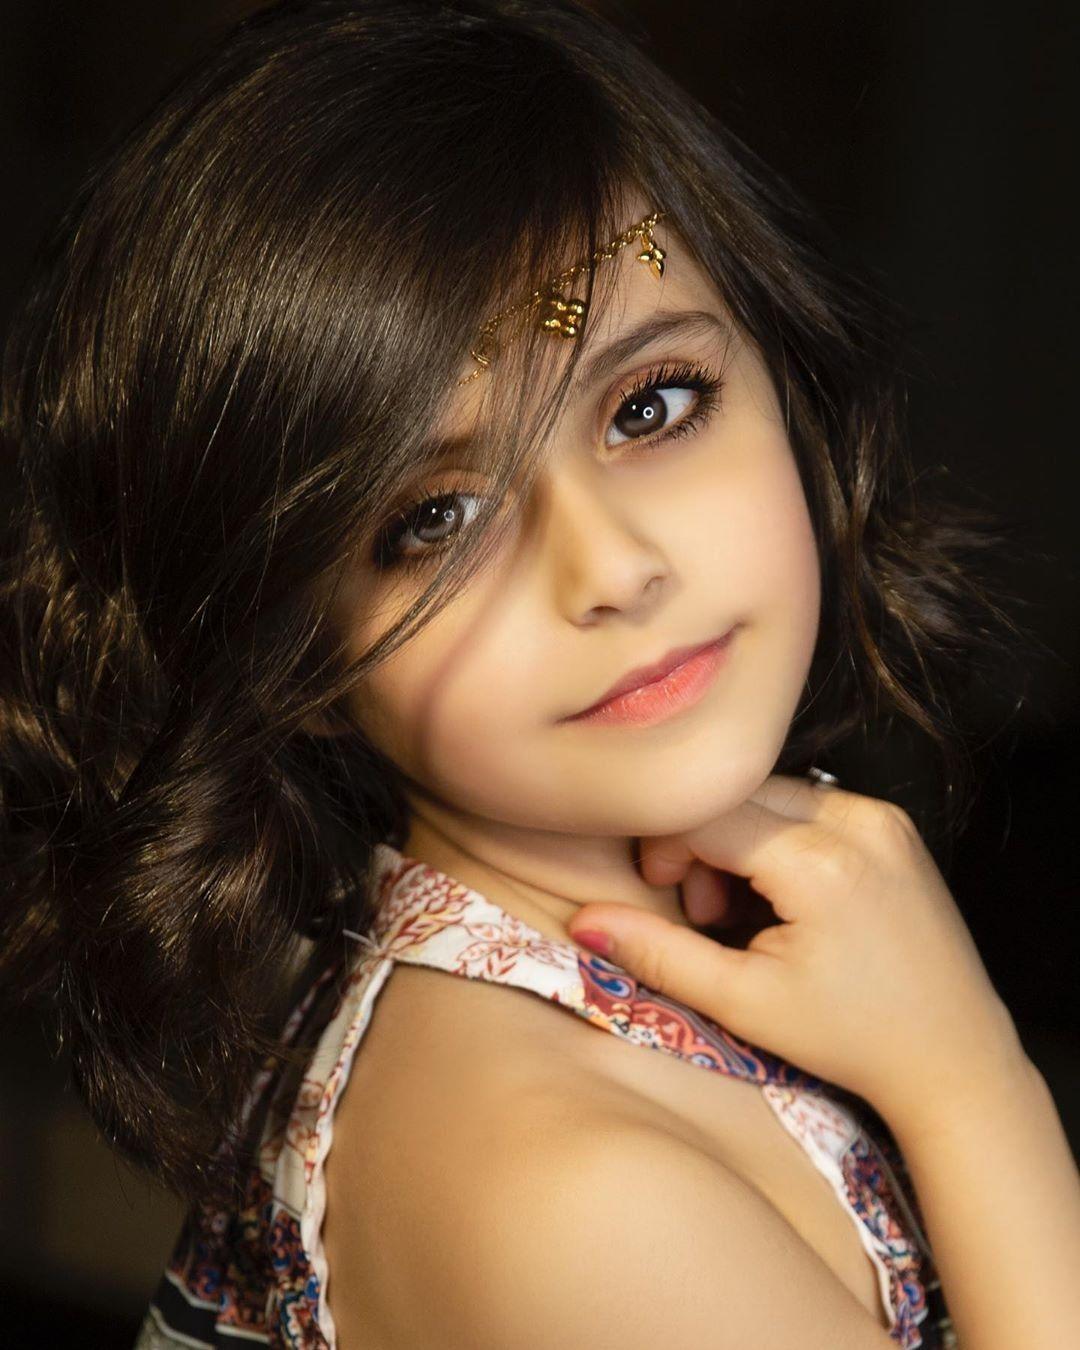 Pin By Manas Singh Manas Singh On غادة السحيم Cute Baby Girl Images Cute Baby Girl Pictures Cute Baby Girl